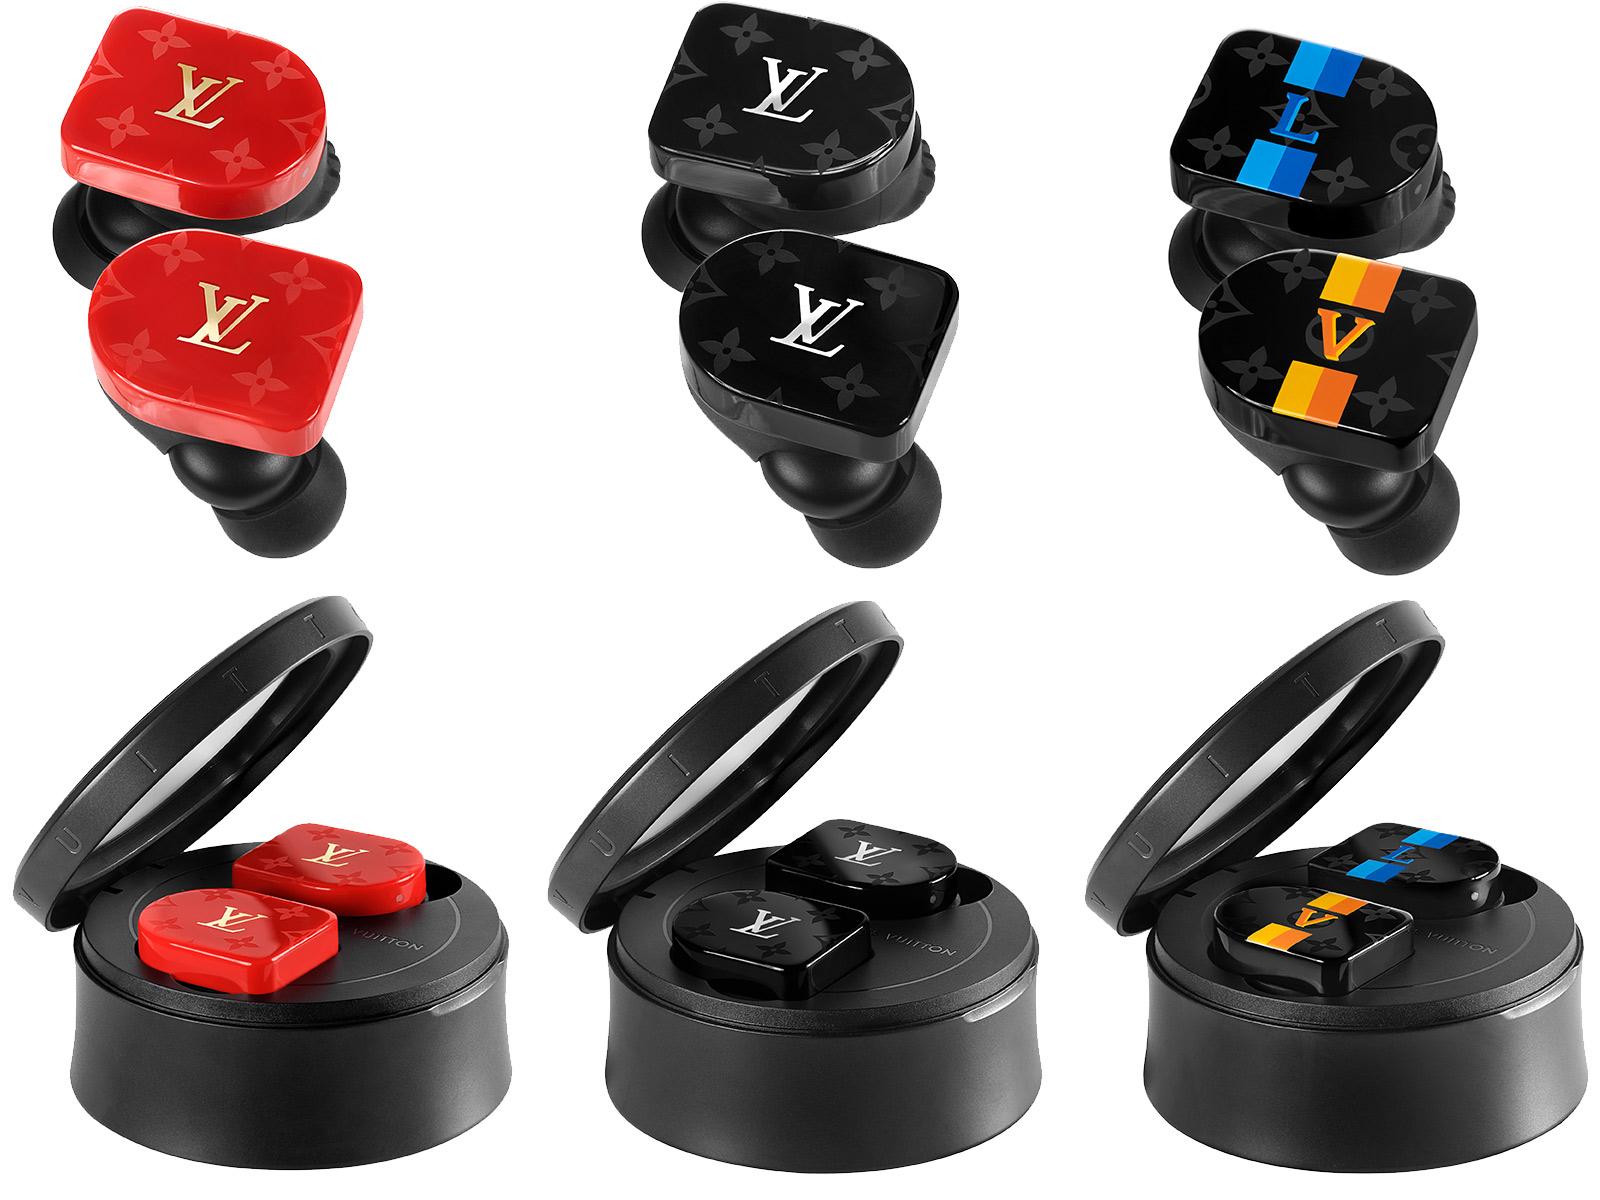 Louis Vuitton Launches A 1 600 Wireless Earphoneslouis Vuitton